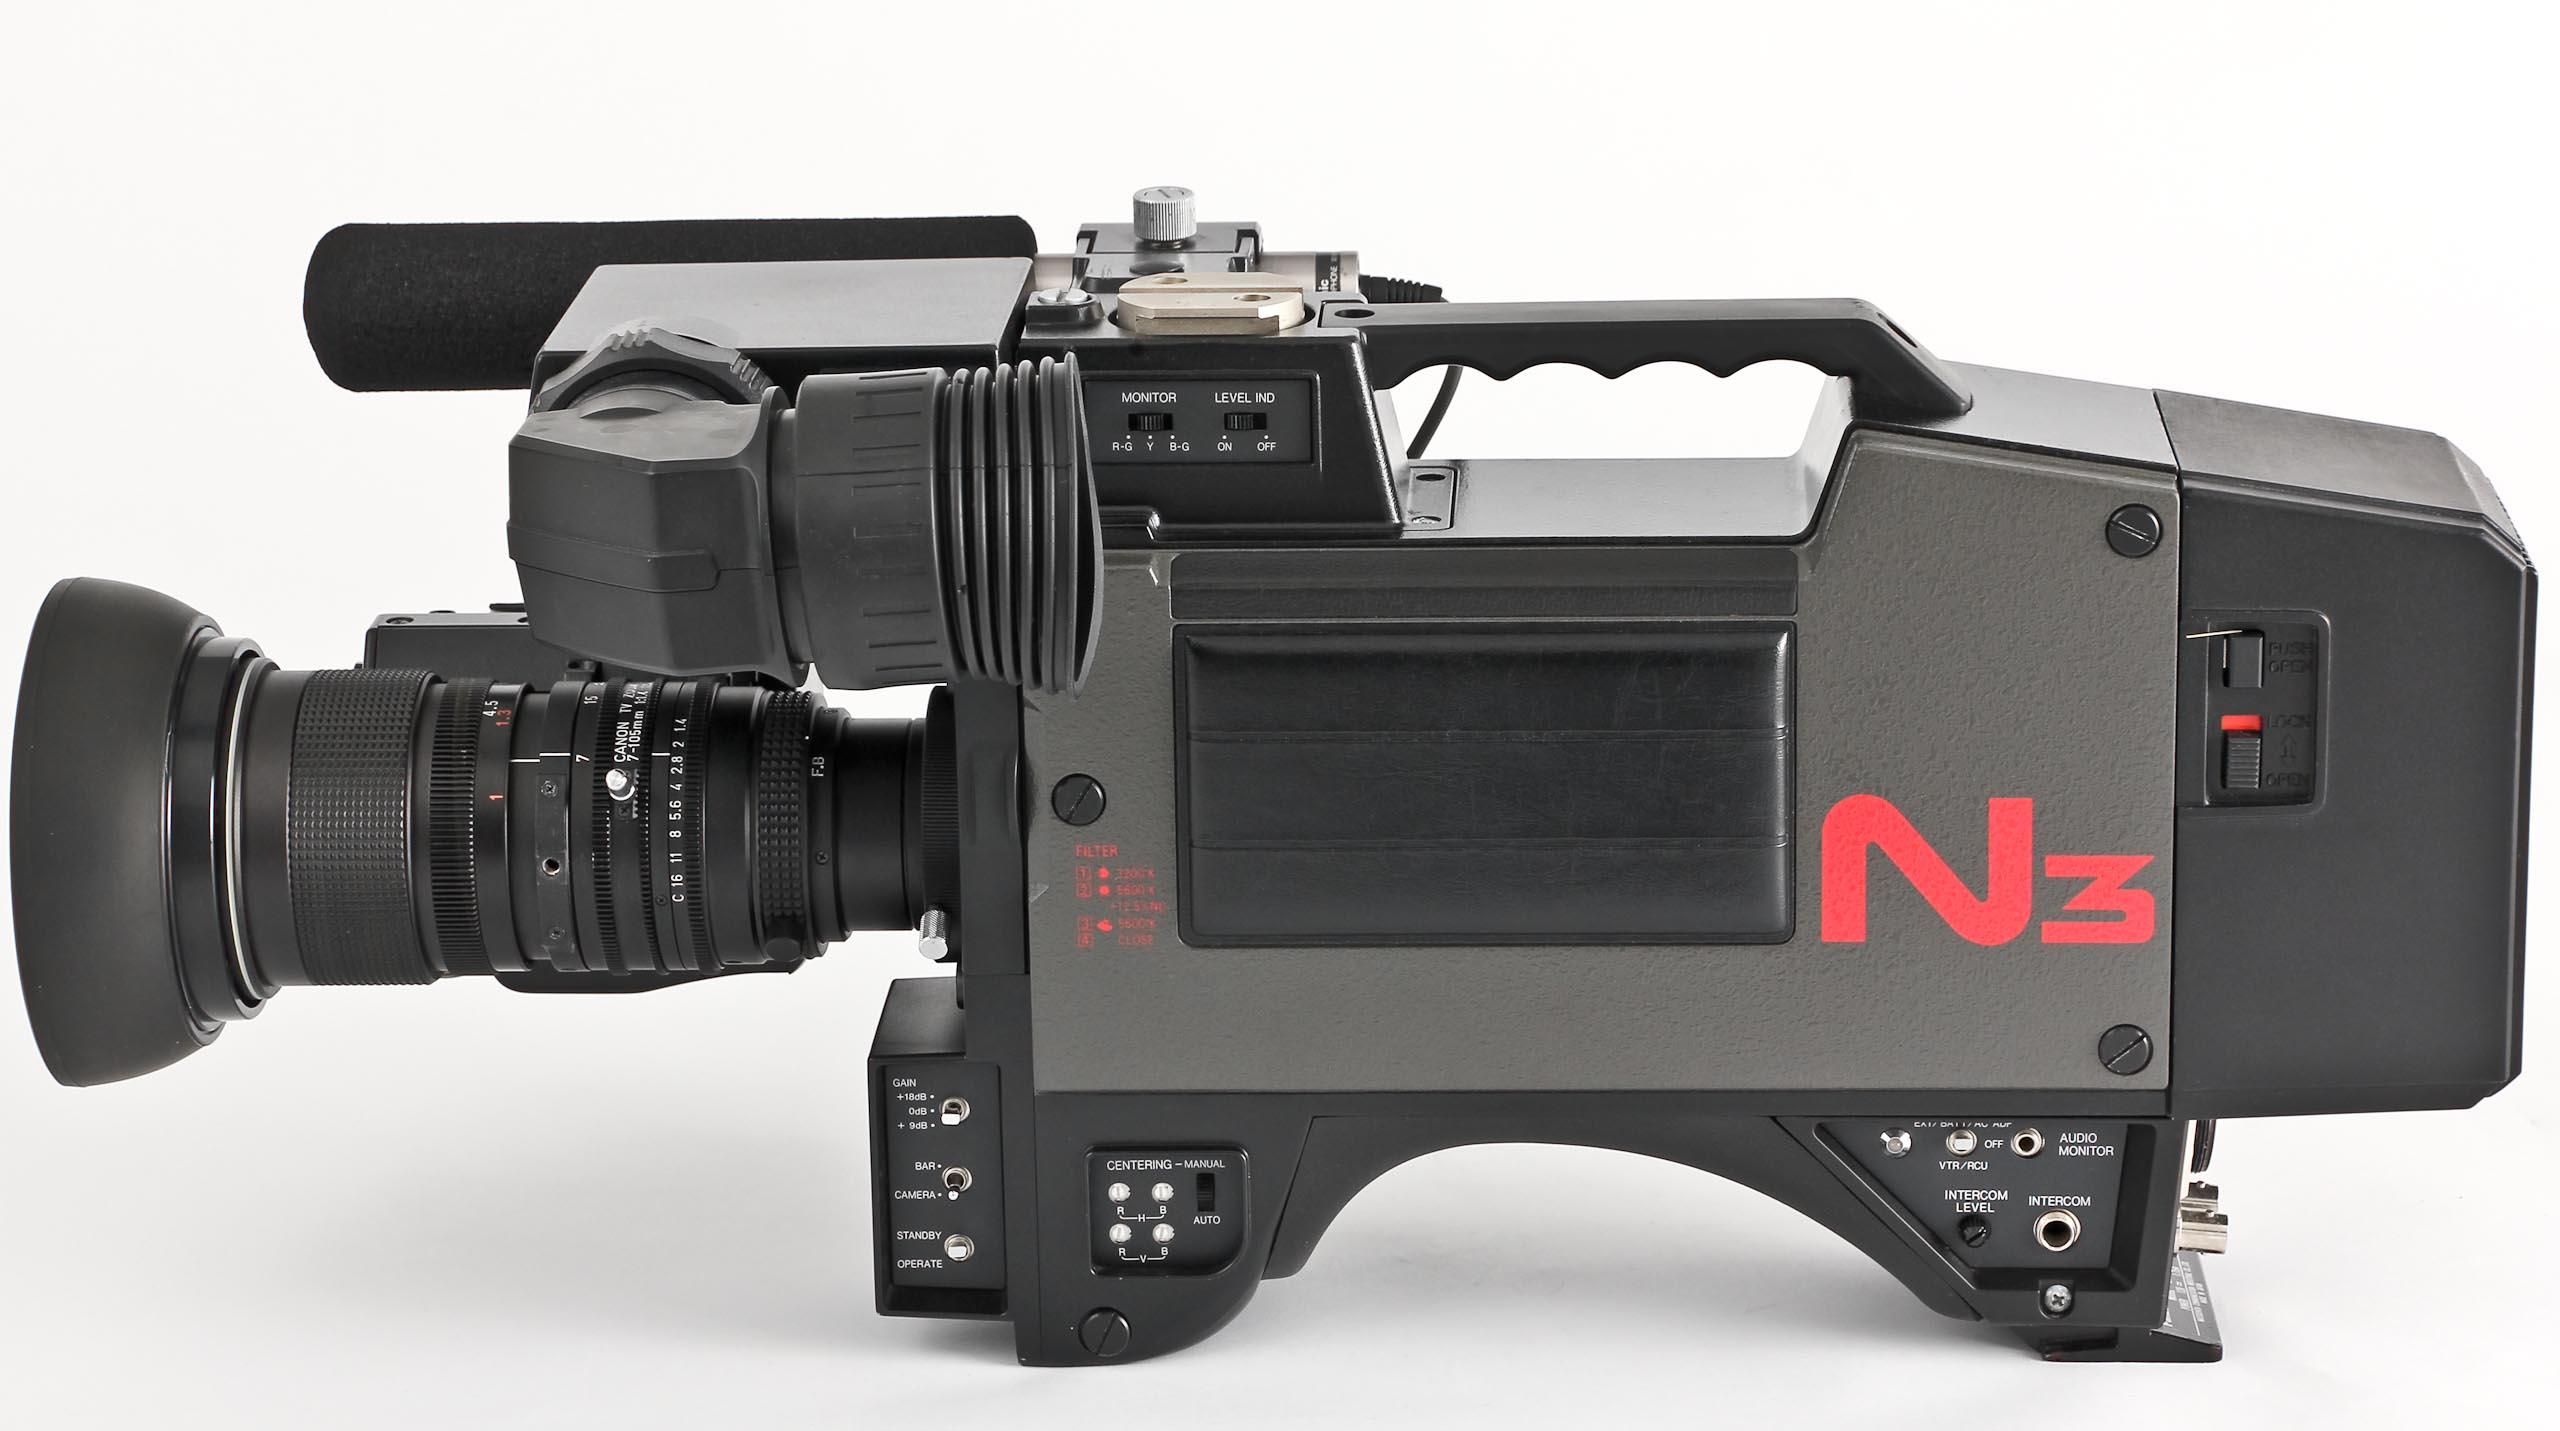 Panasonic-WV-N3 - 2